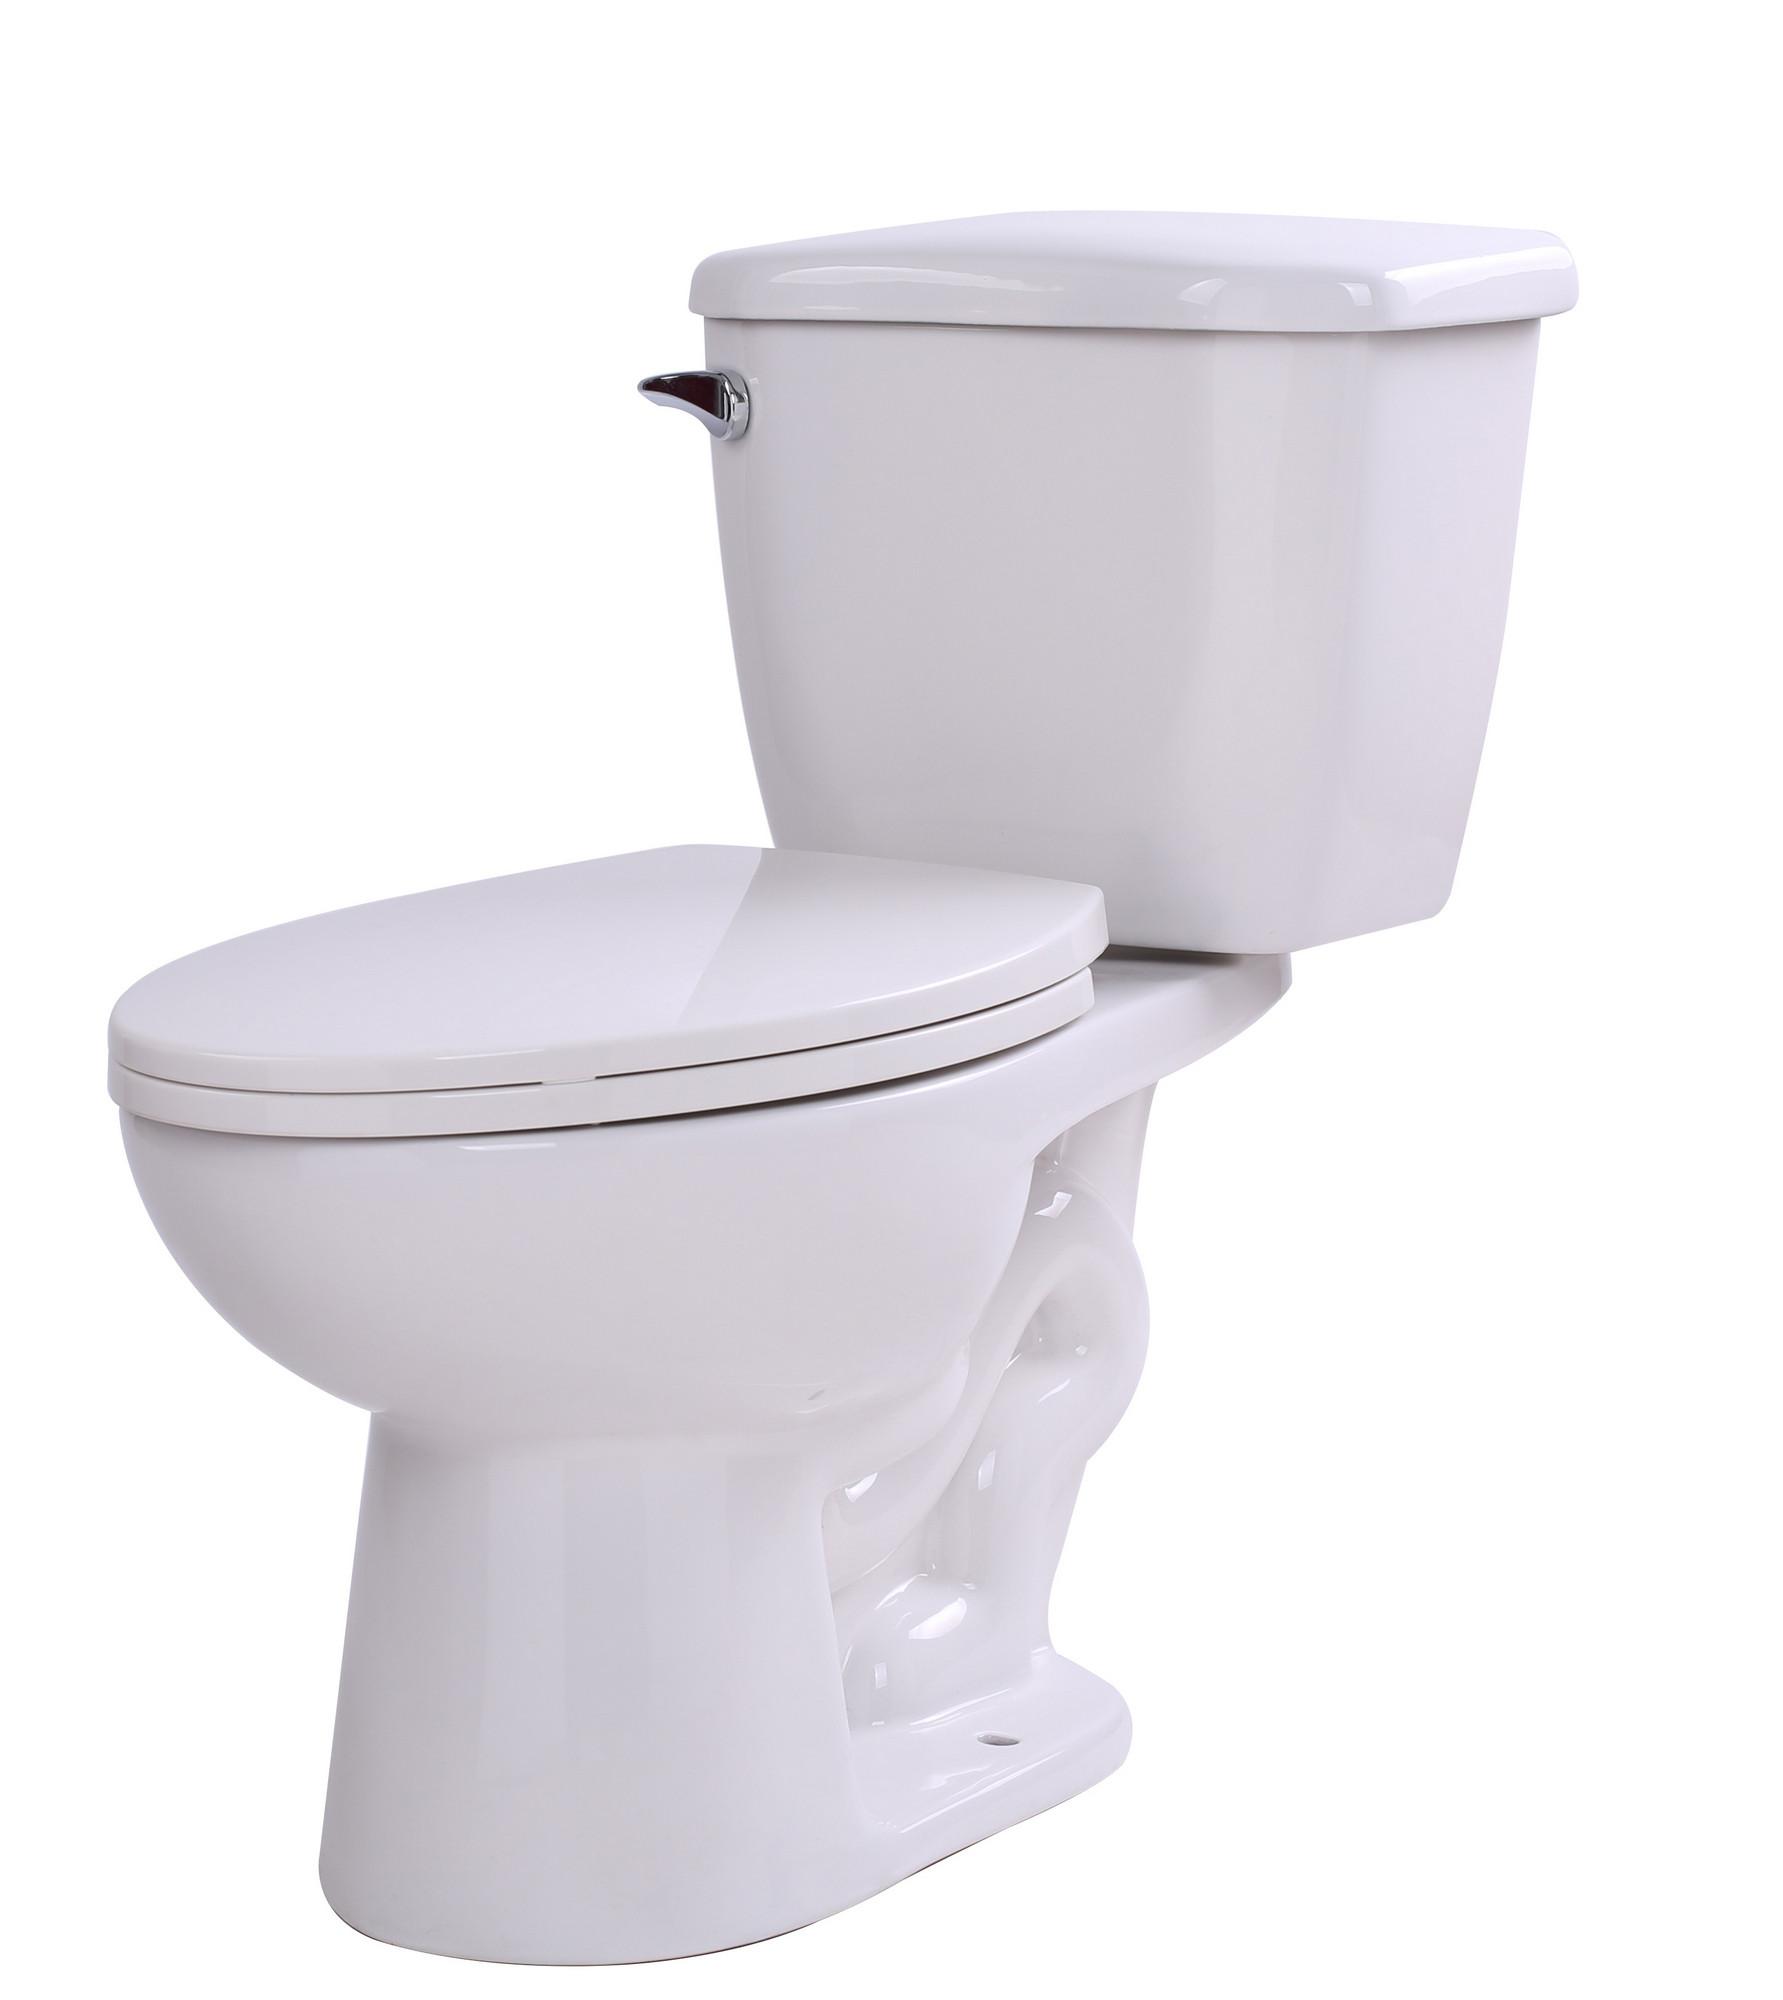 ANZZI T1-AZ055 Kame 2 Piece Single Flush Elongated Toilet In White